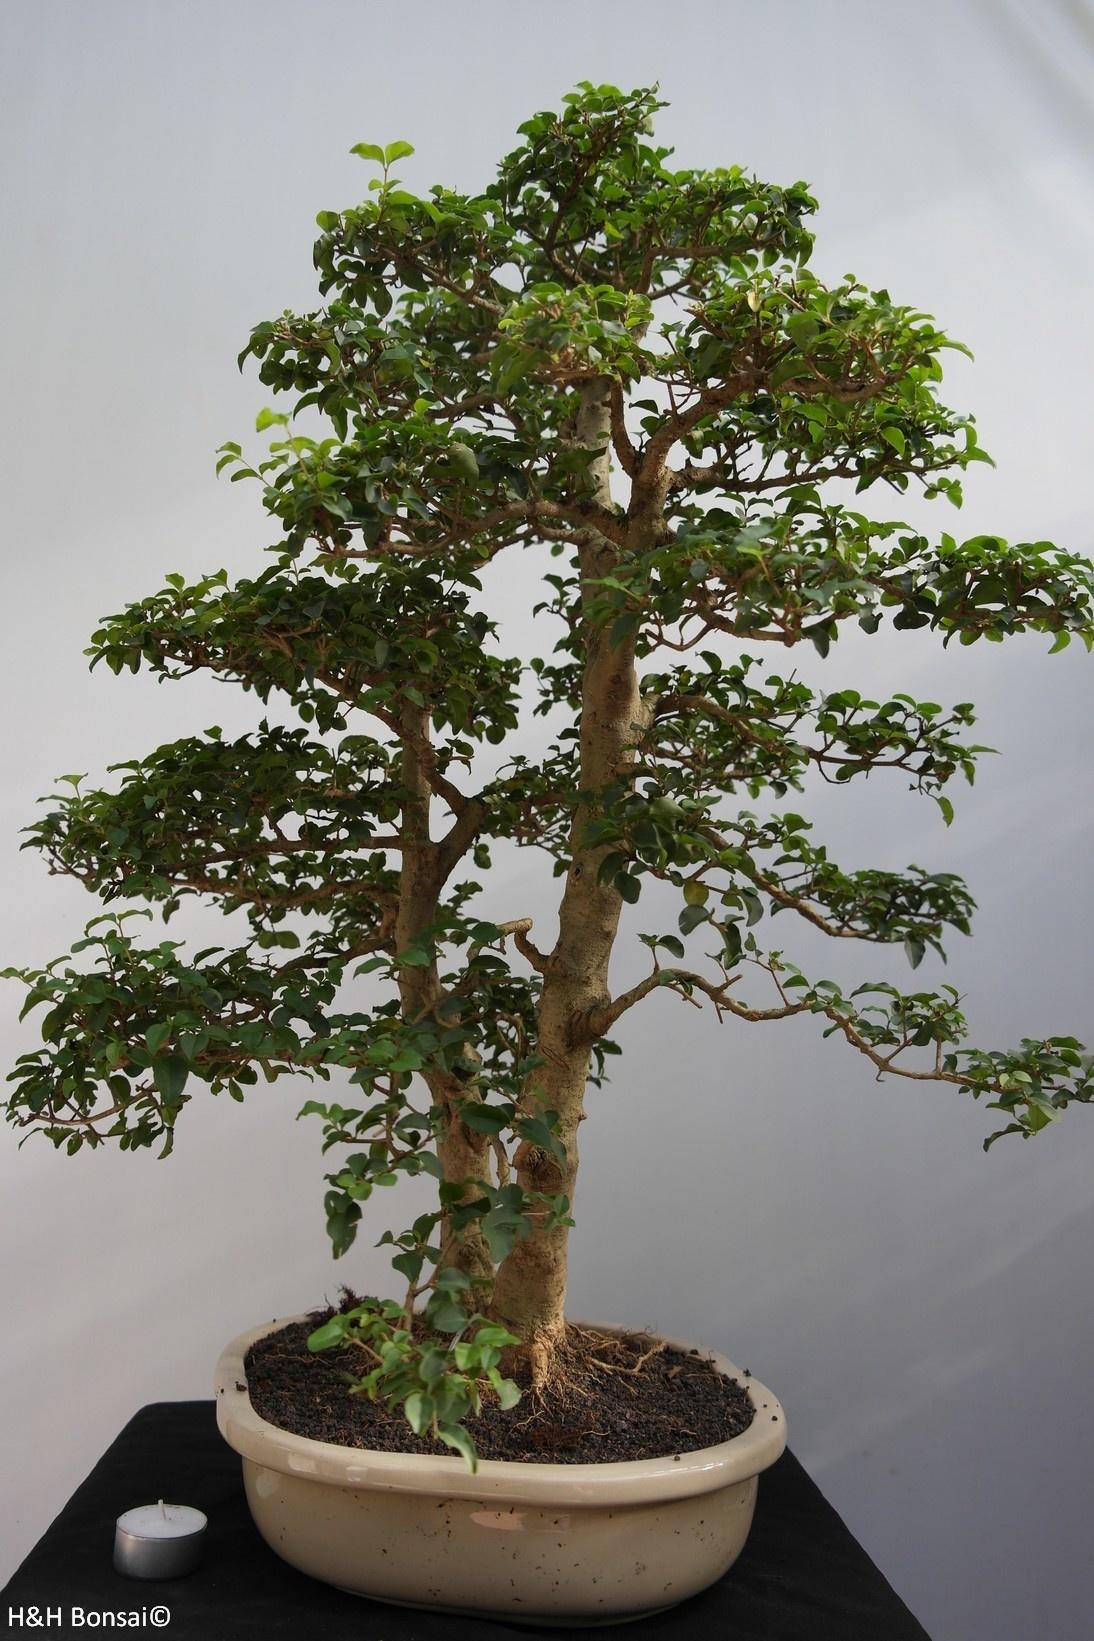 Bonsai Ligustro, Ligustrumsinense, no. 7841